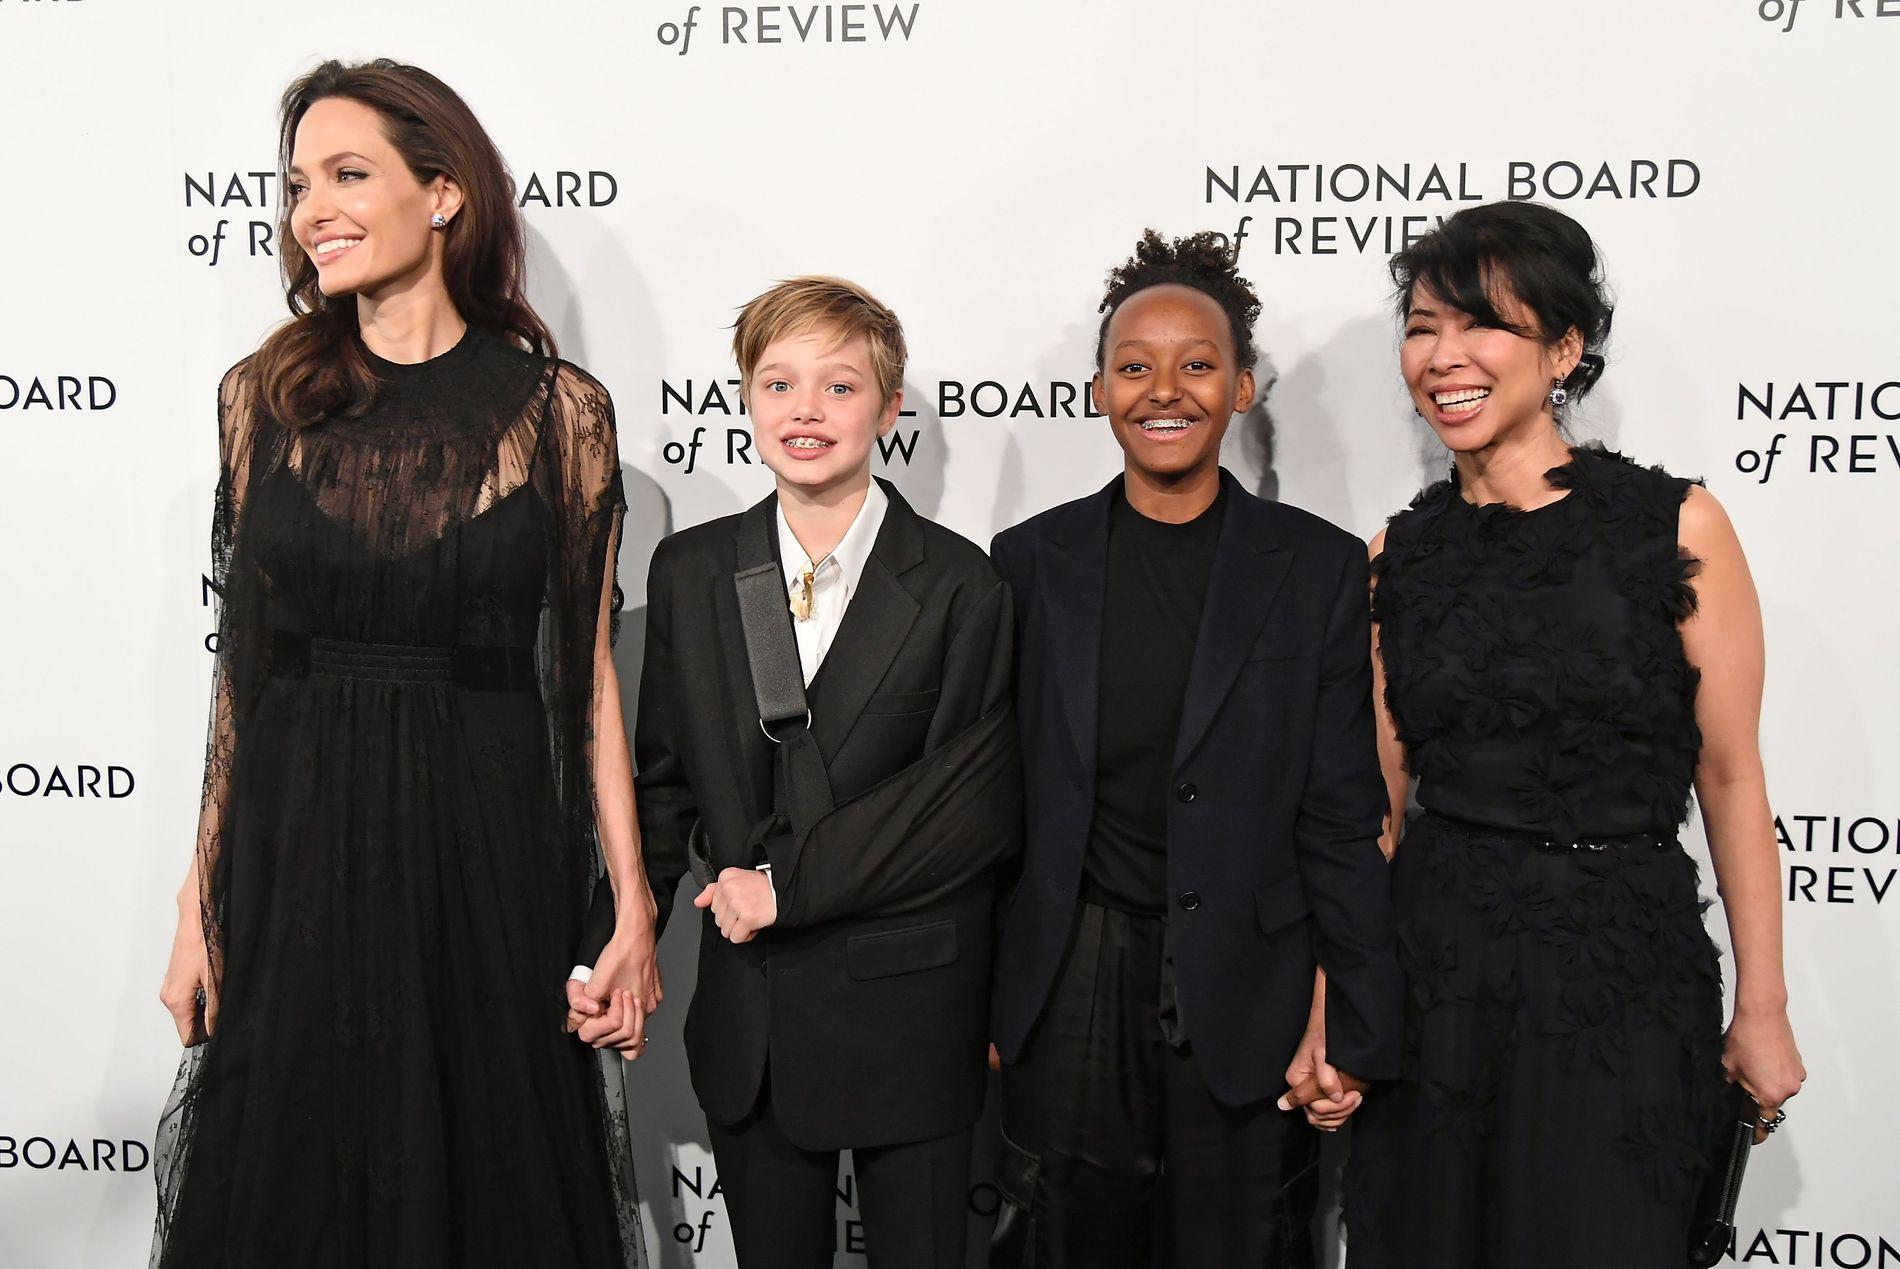 PÅ GALLA: Angelina Jolie, Shiloh Jolie-Pitt, Zahara Jolie-Pitt og Loung Ung på National Board of Review Awards Gala i New York tirsdag.